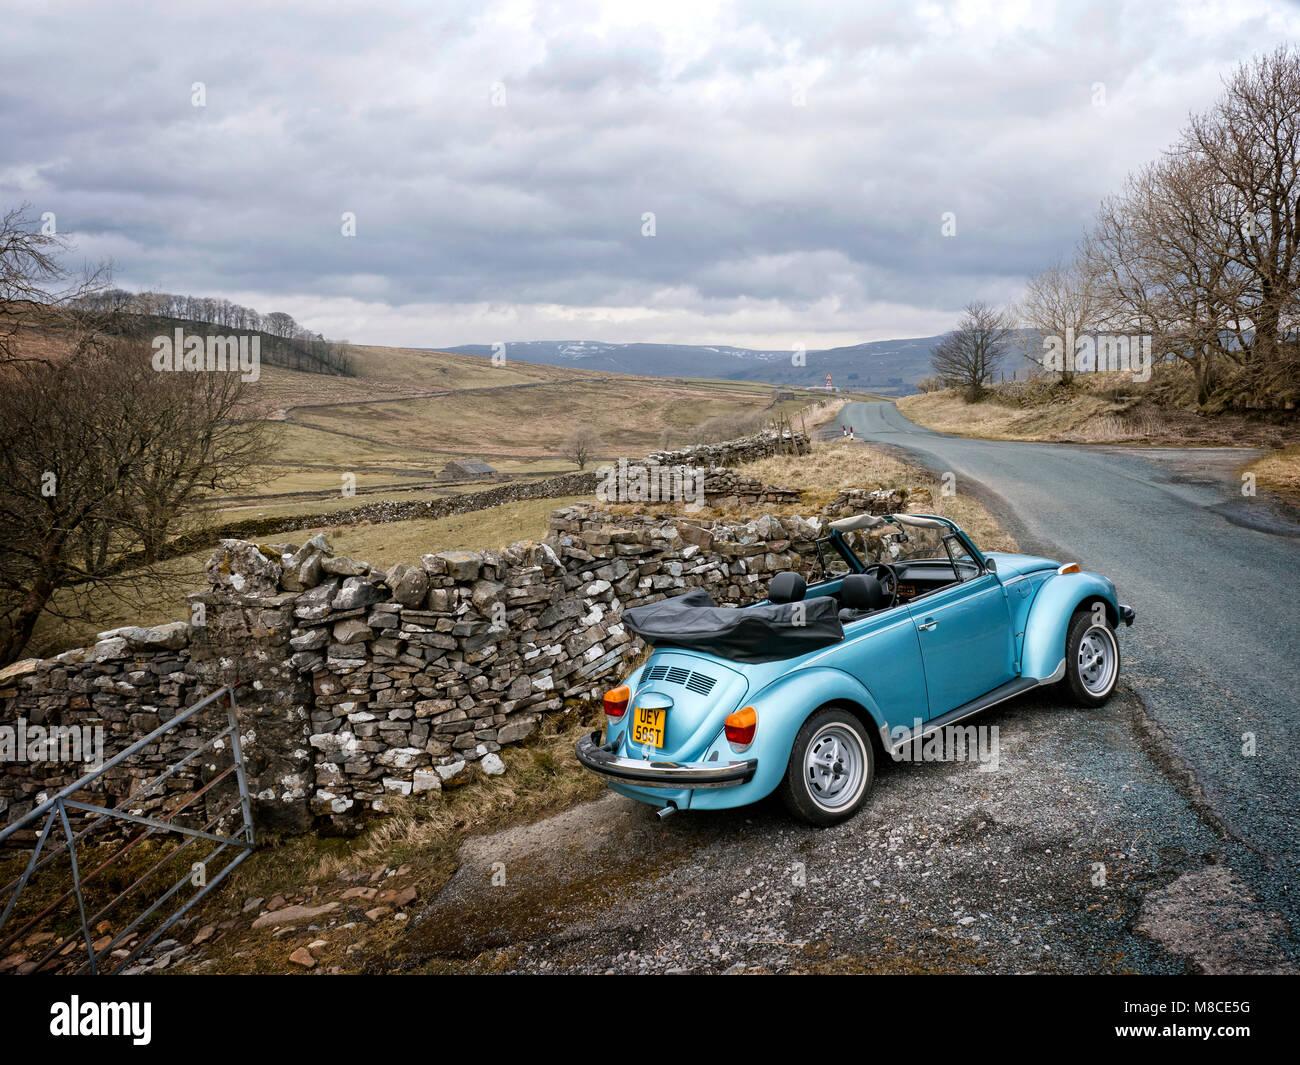 1979 VW Super Beetle cabriolet driving in Yorkshire Dales National Park UK - Stock Image